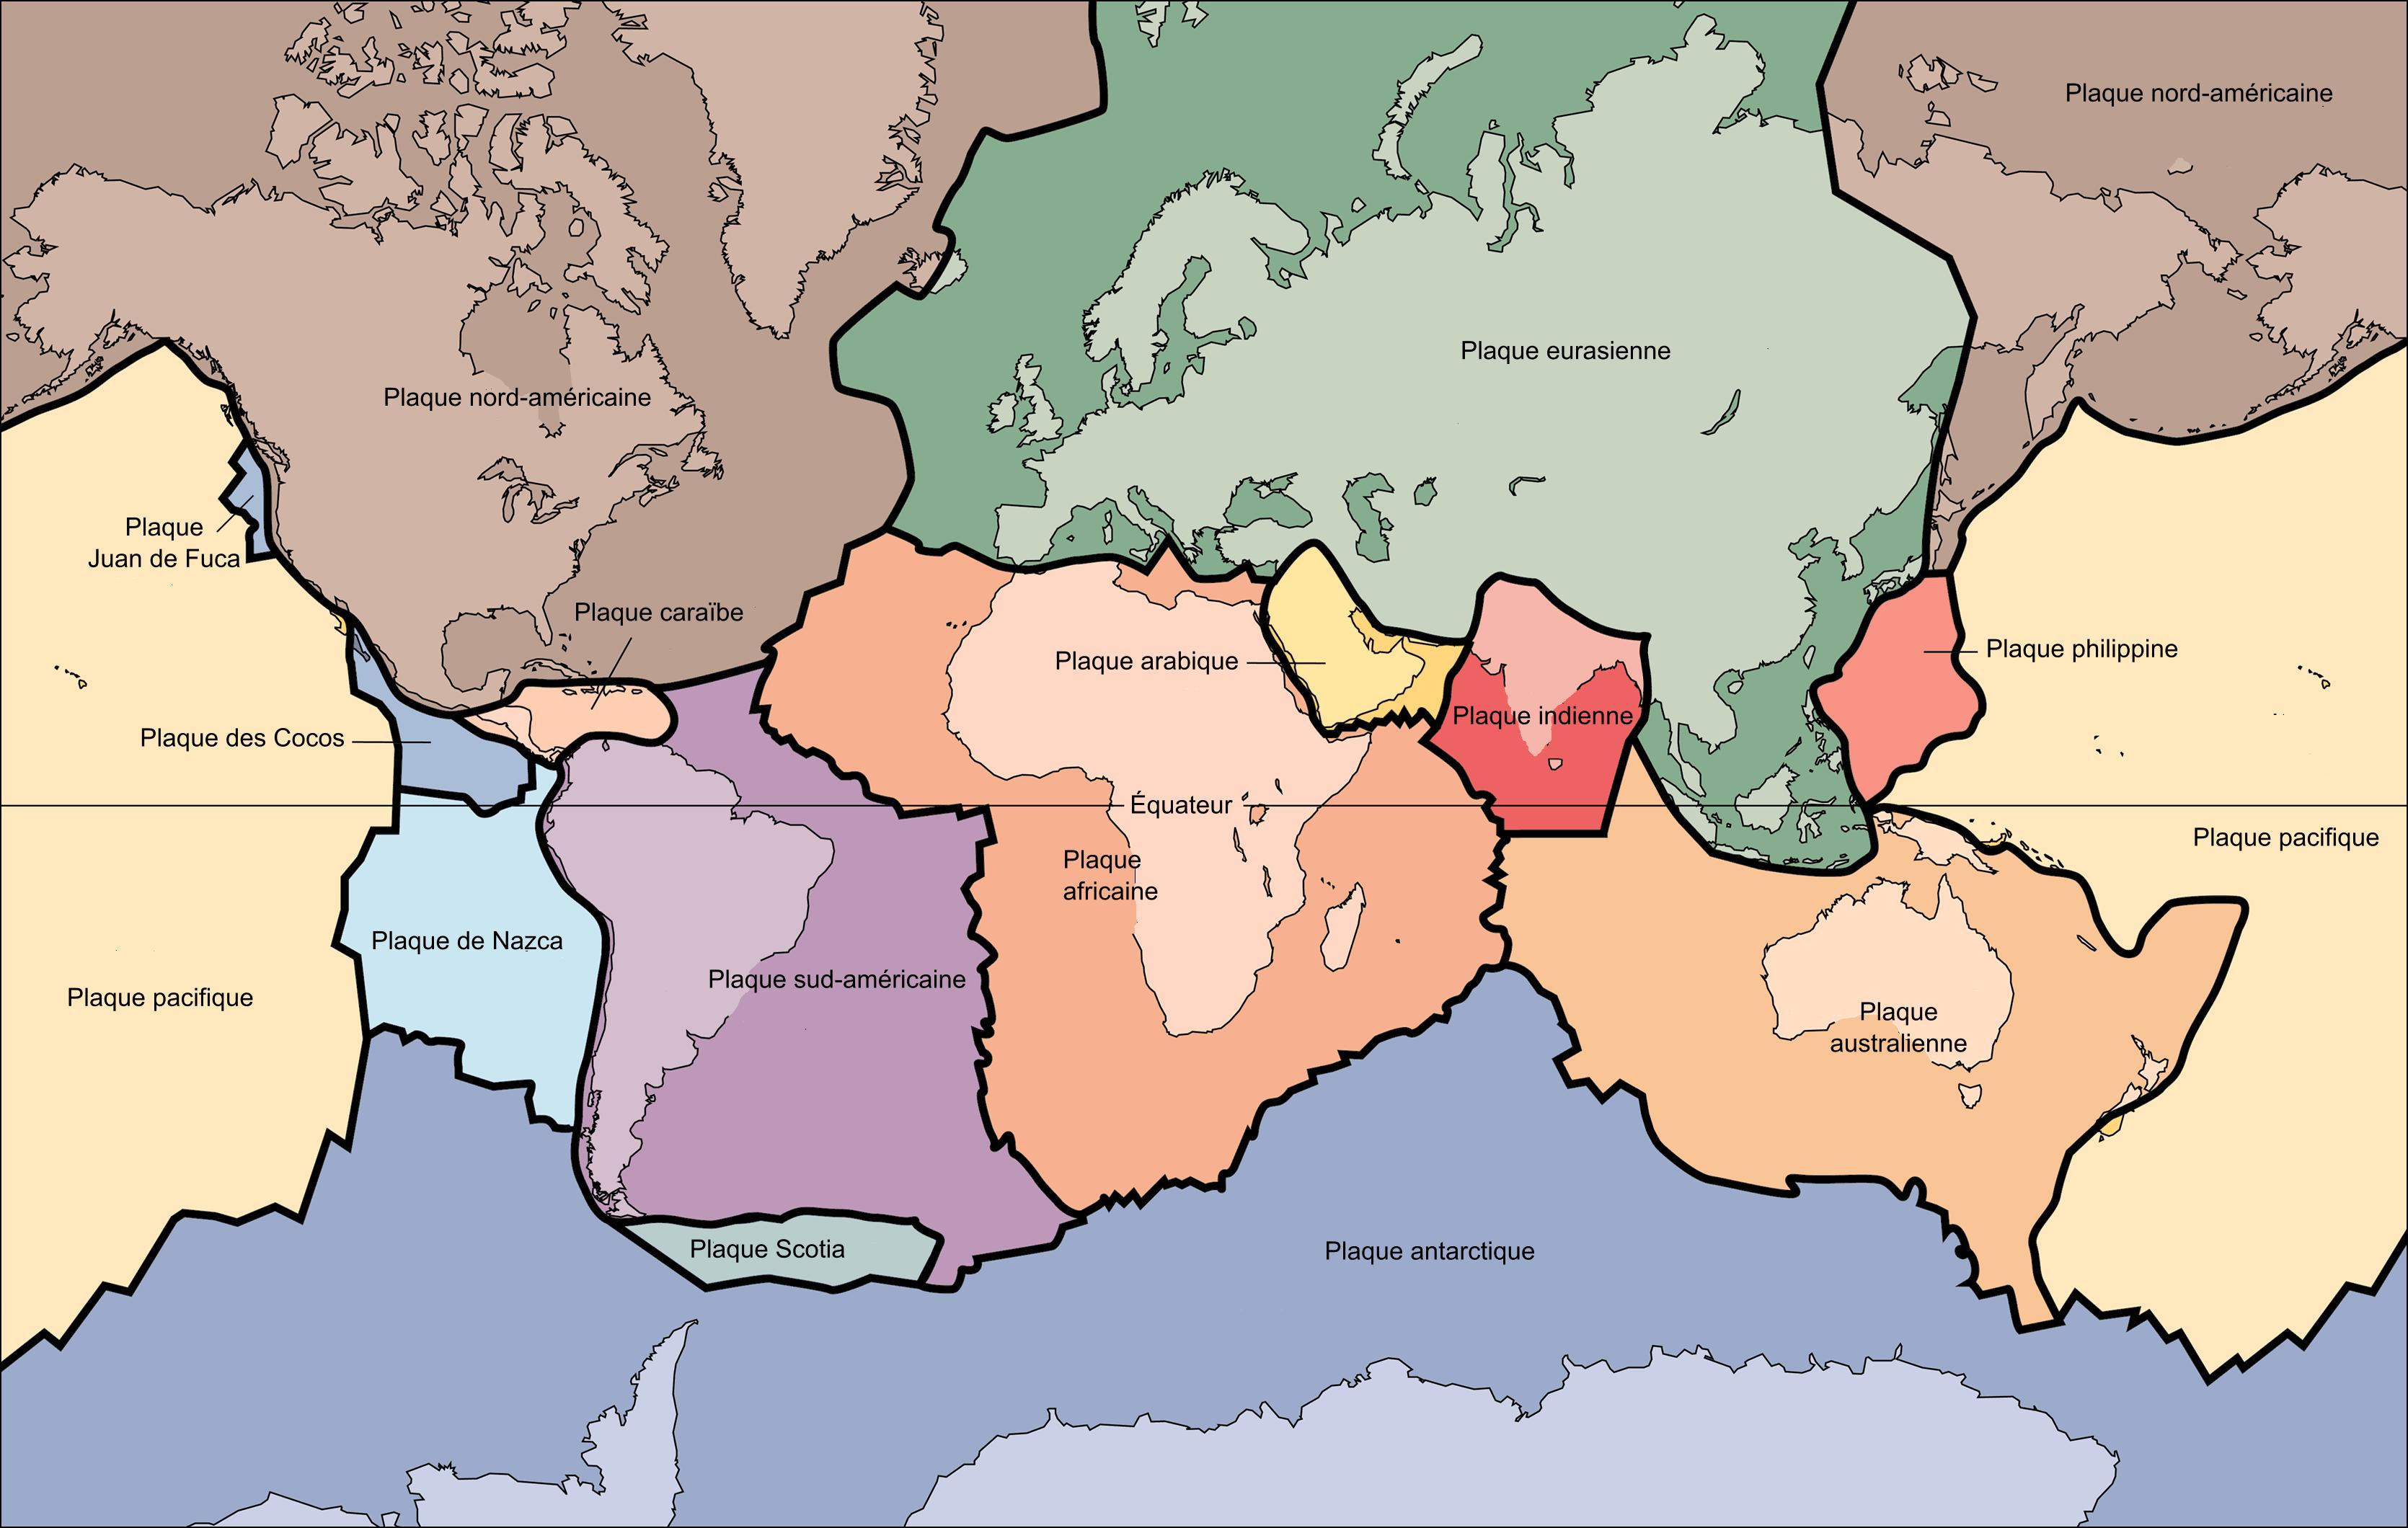 File:Tectonic plates.